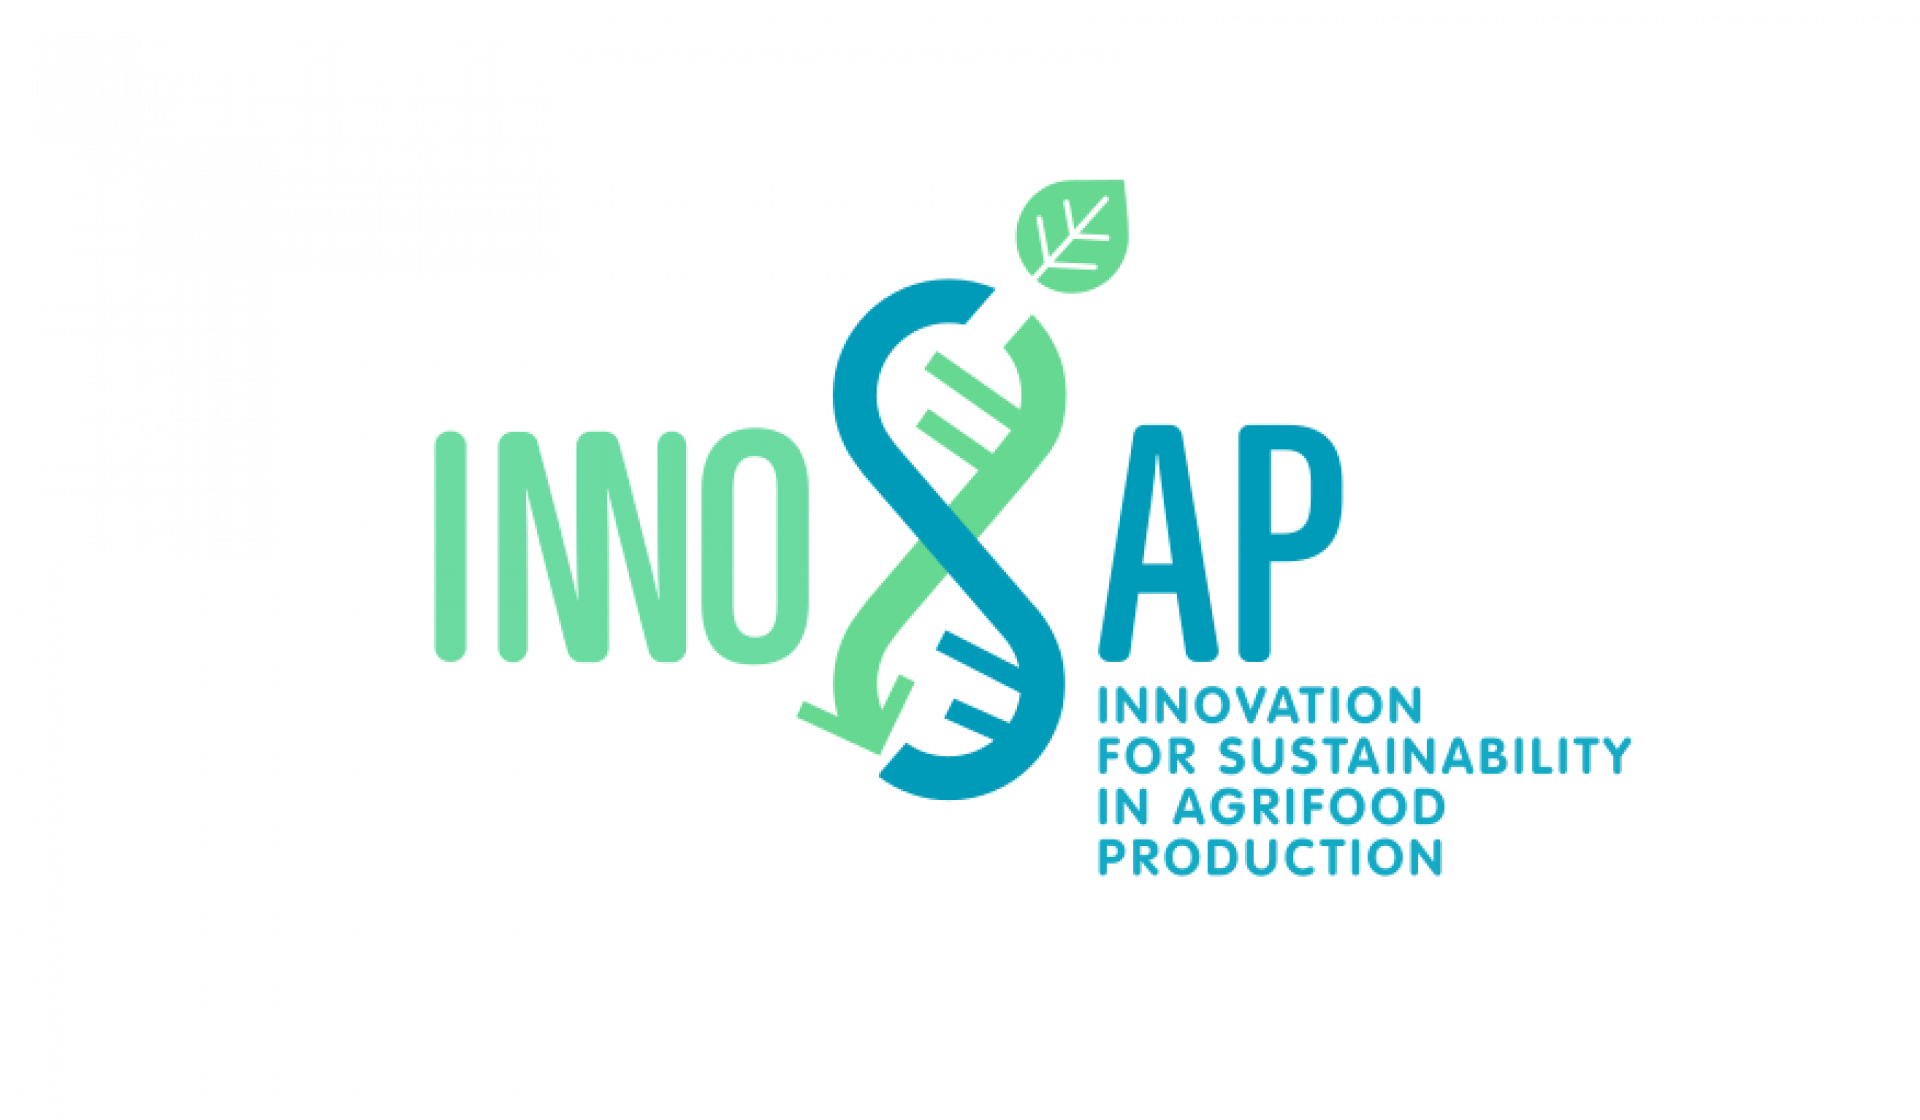 Innosap - Promotore